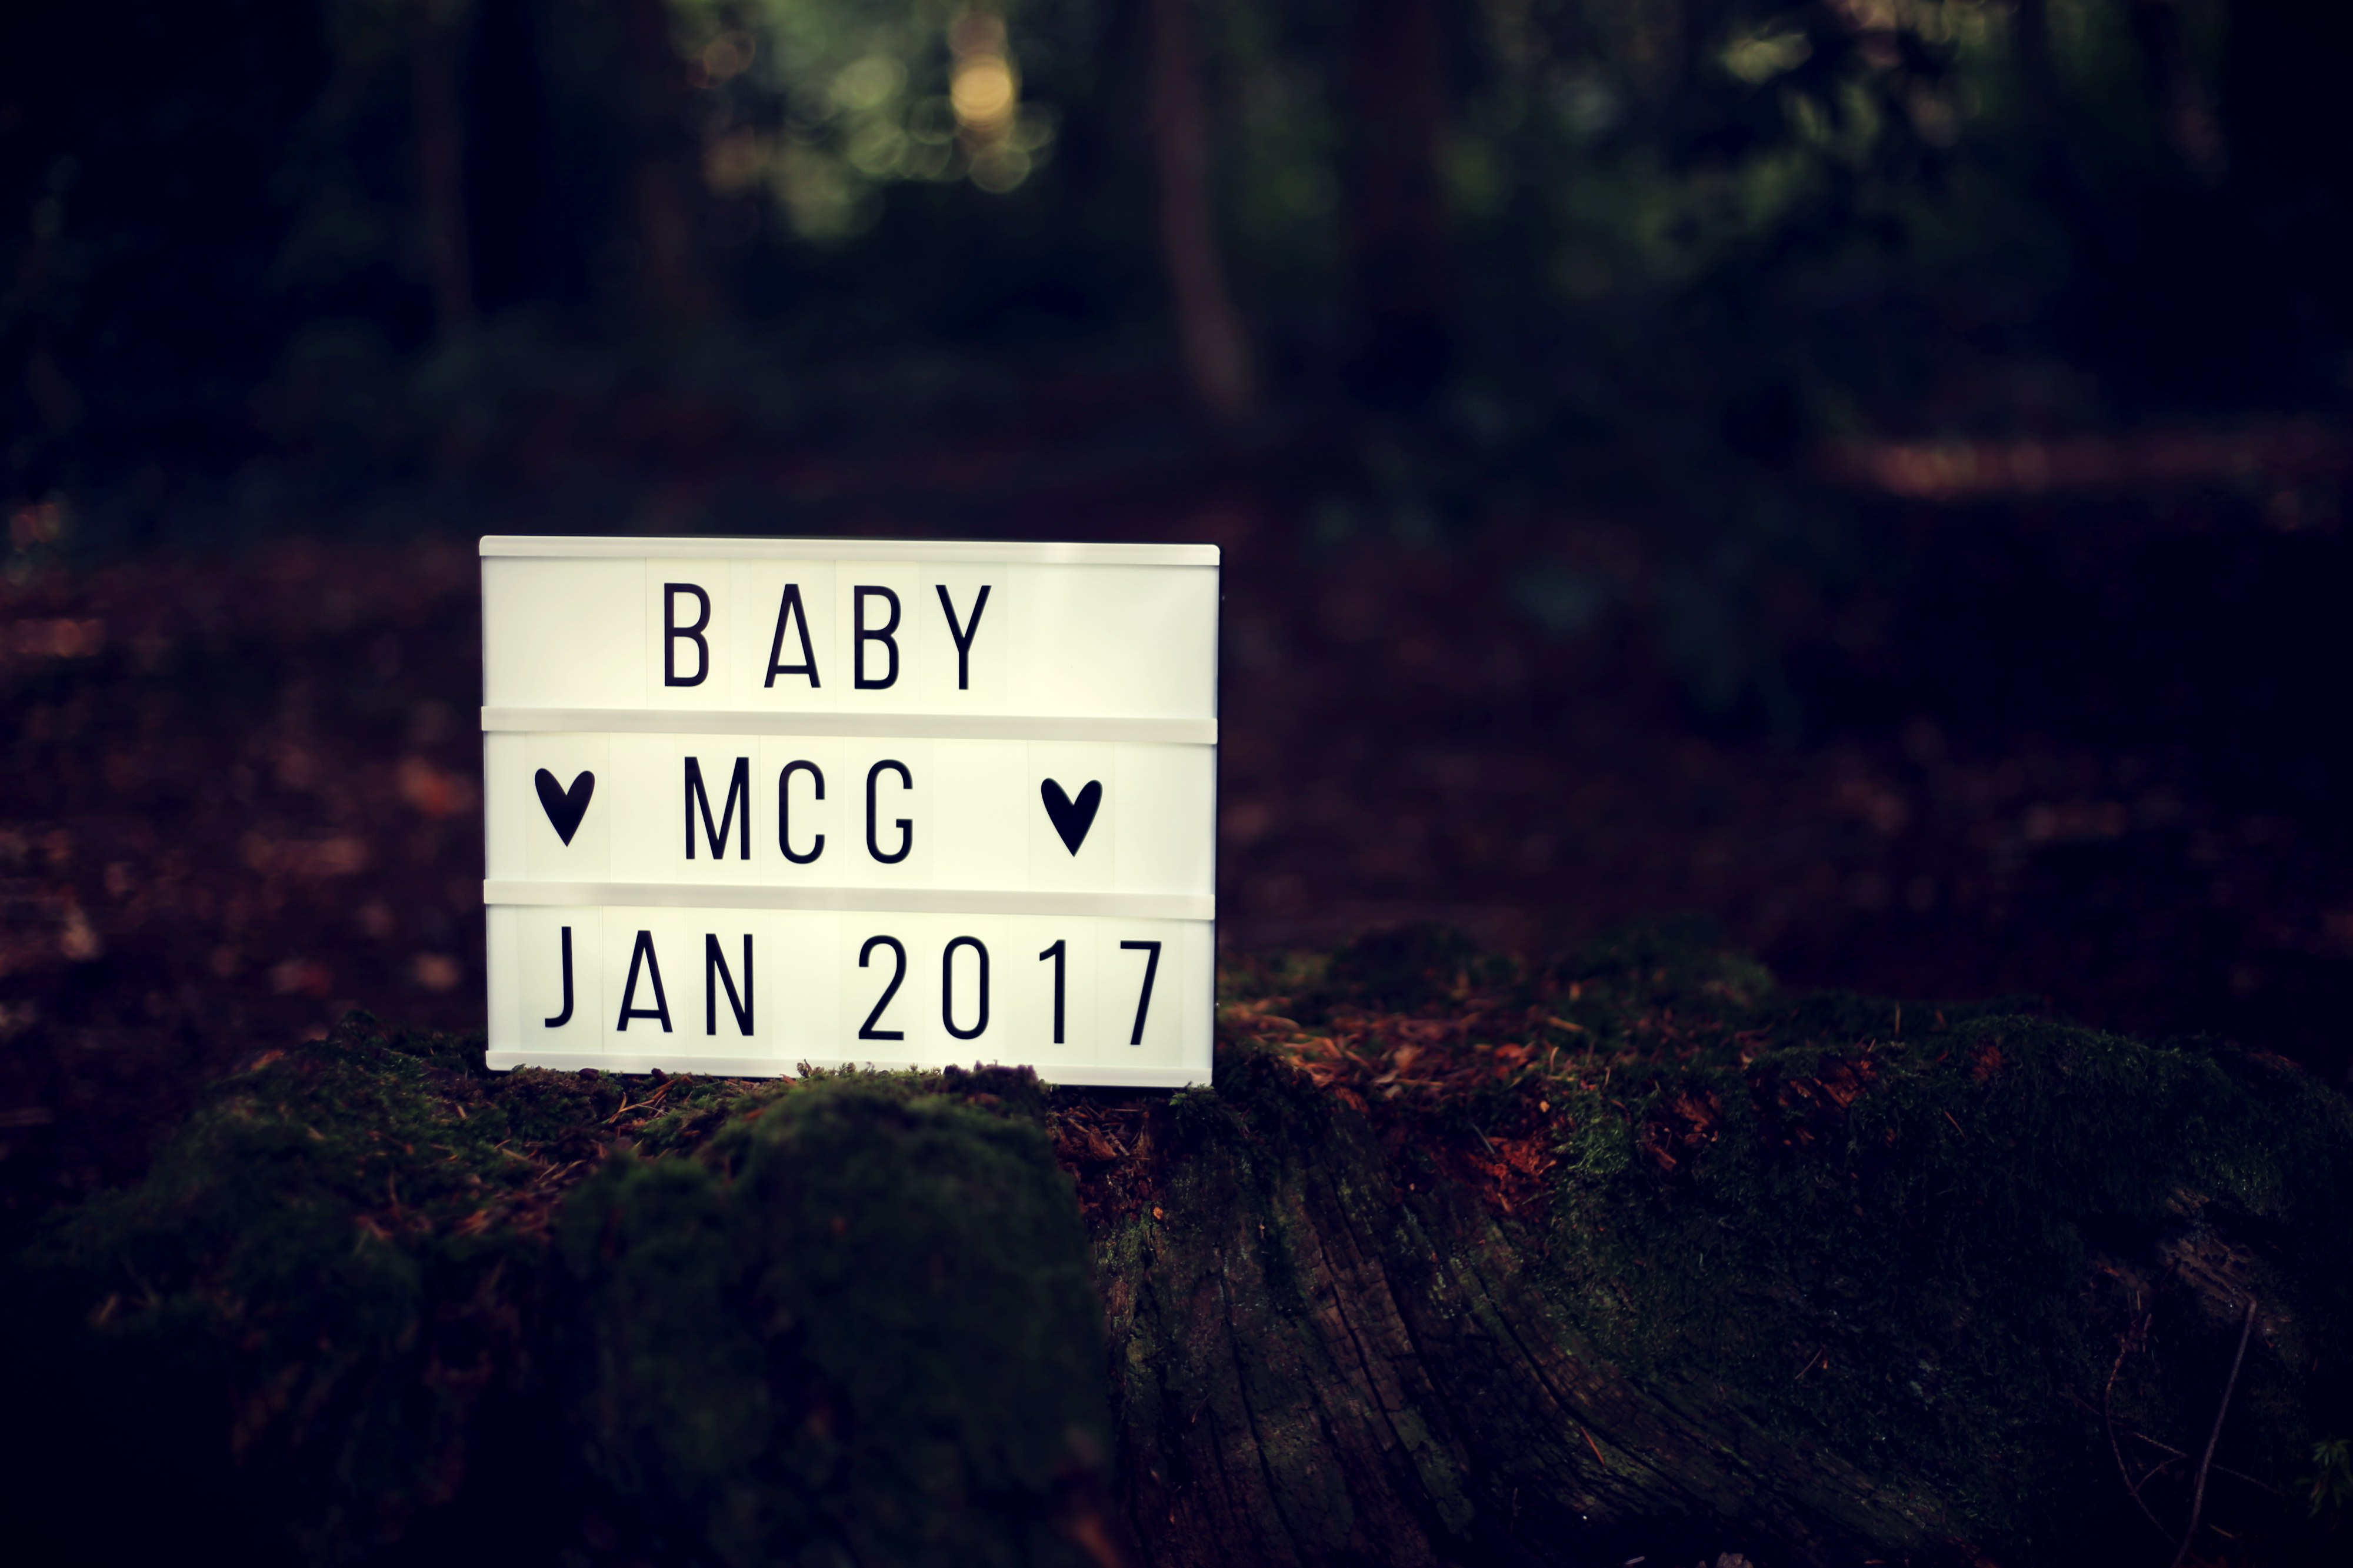 baby mcg